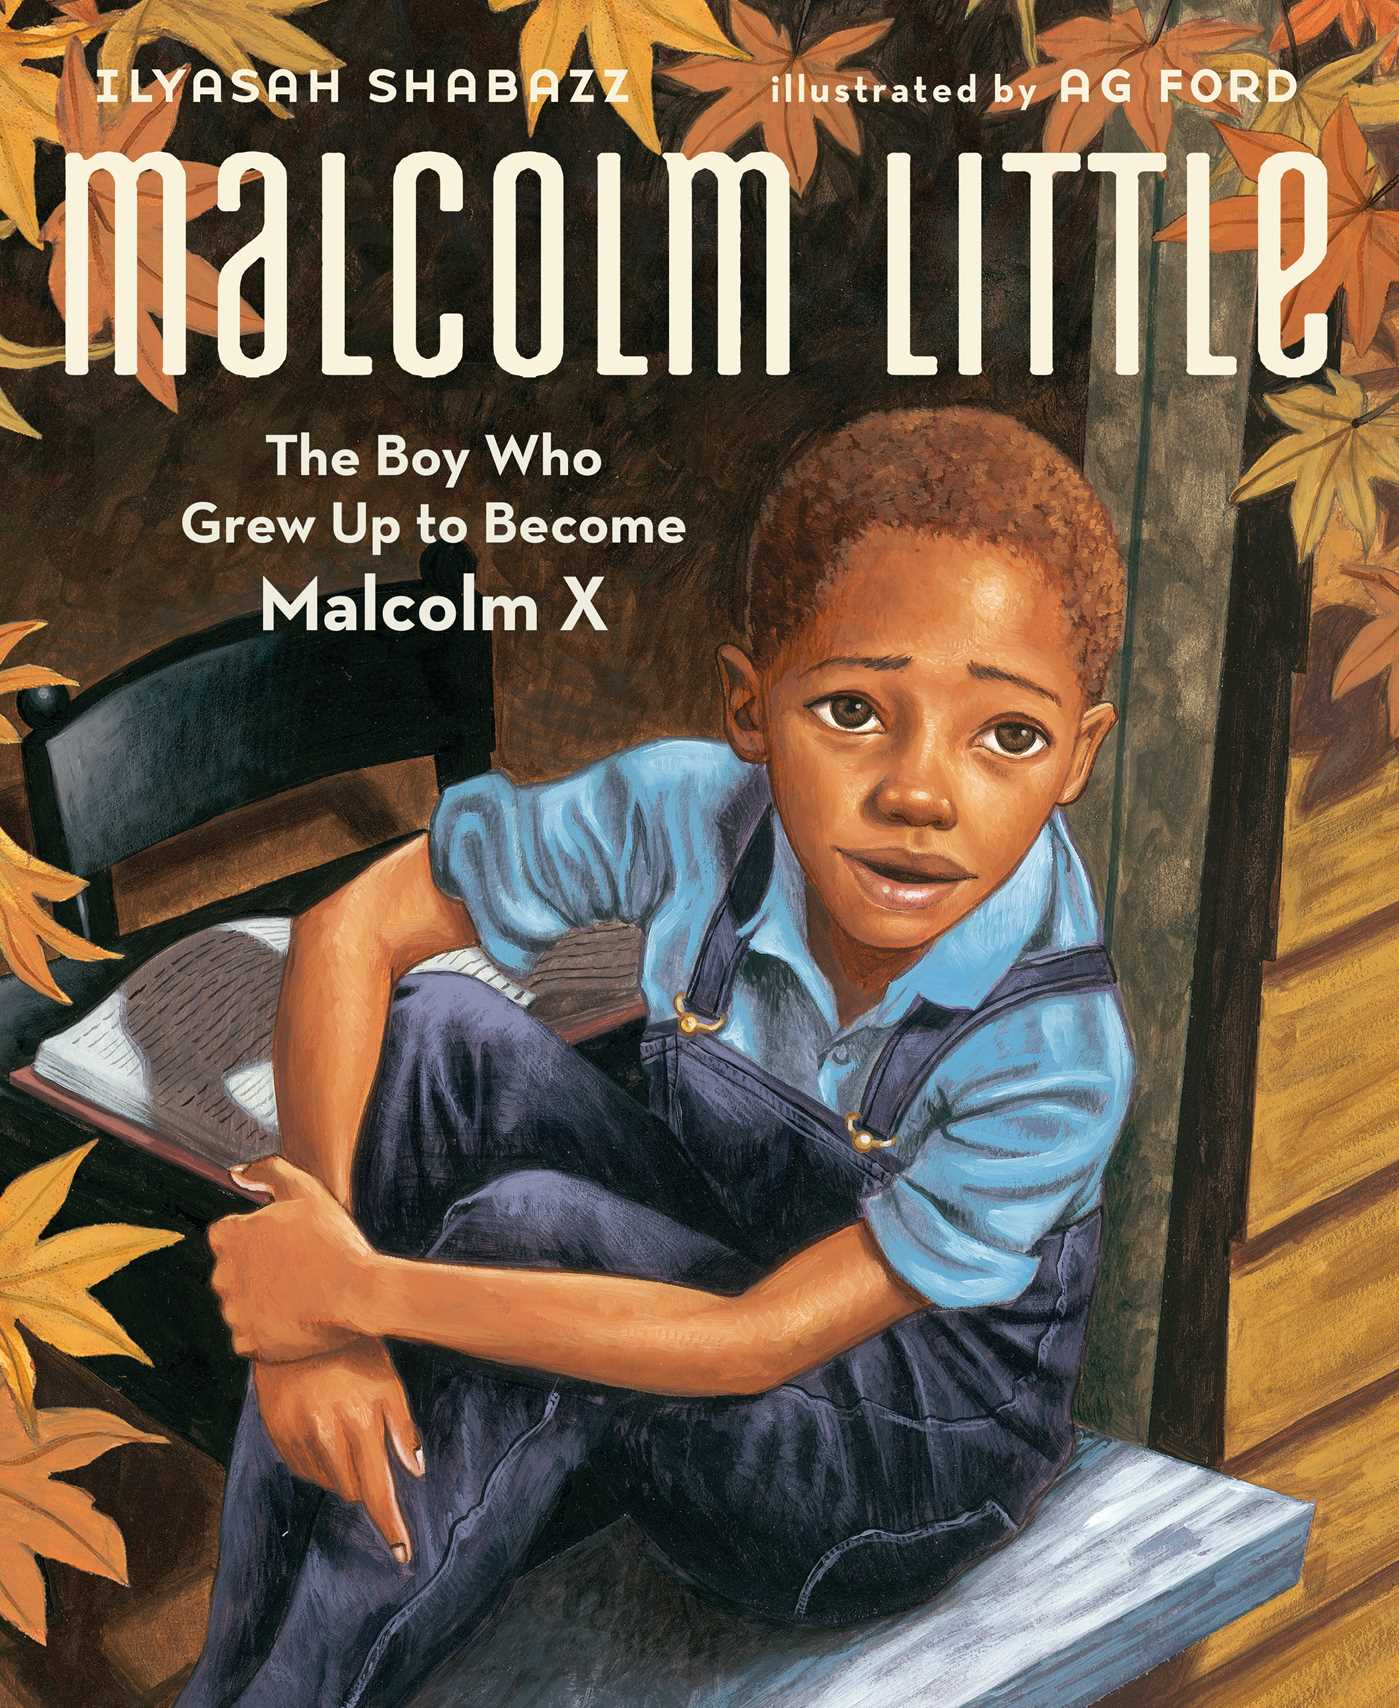 Malcolm little 9781442433045 hr